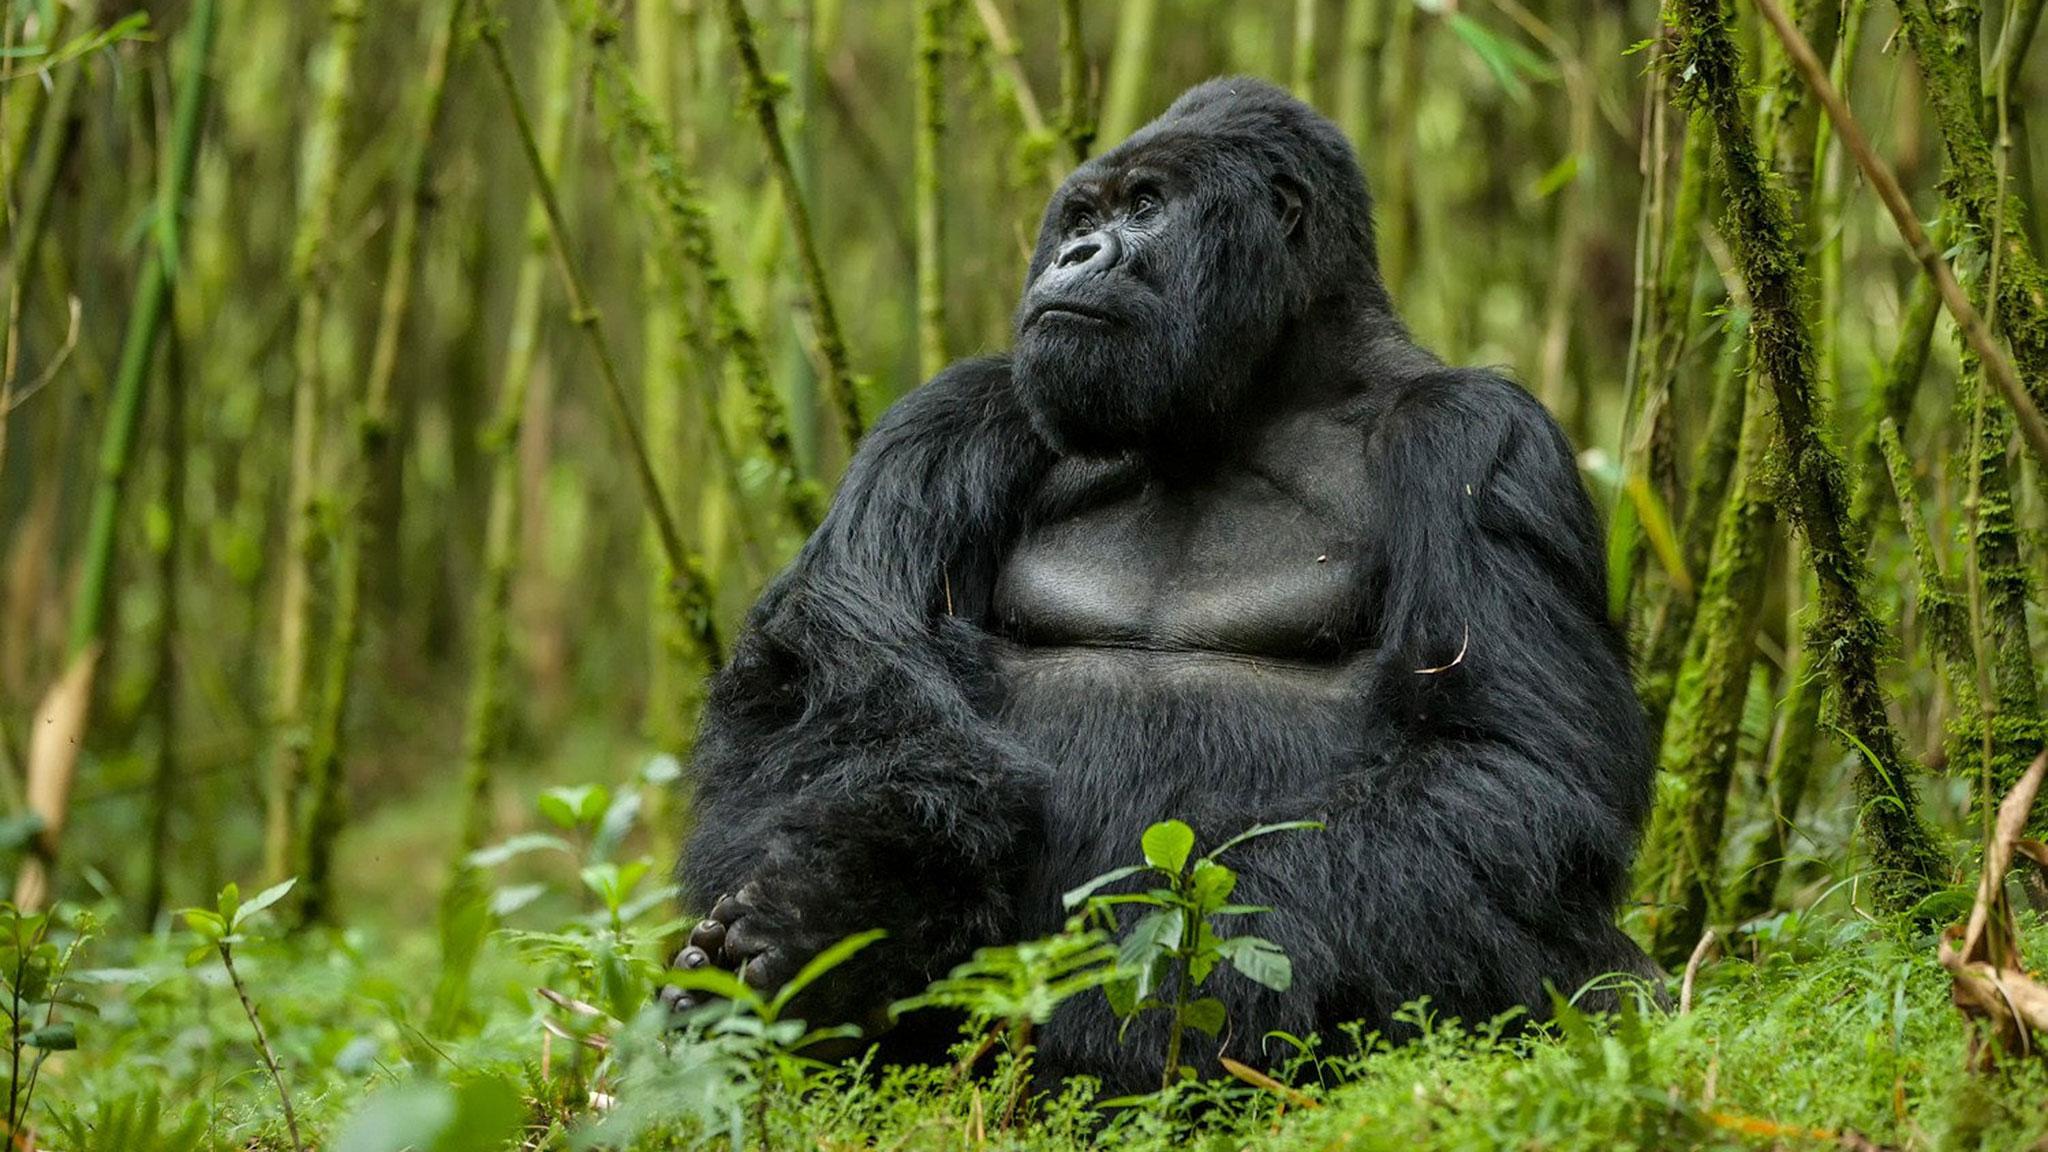 Gorilla In Jungle